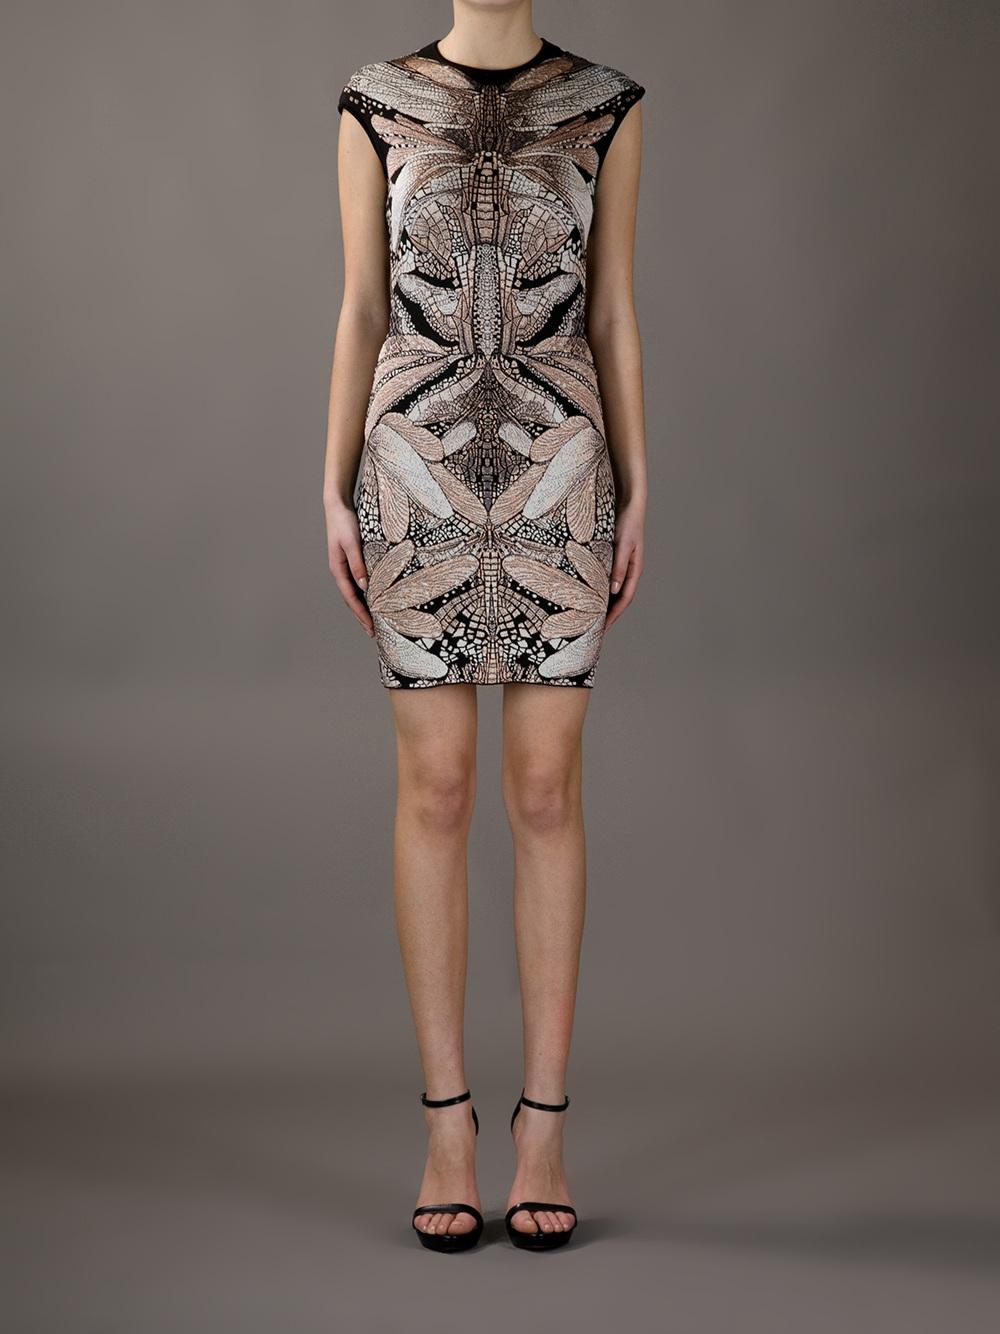 Alexander Mcqueen Dragonfly Print Bodycon Dress In Black